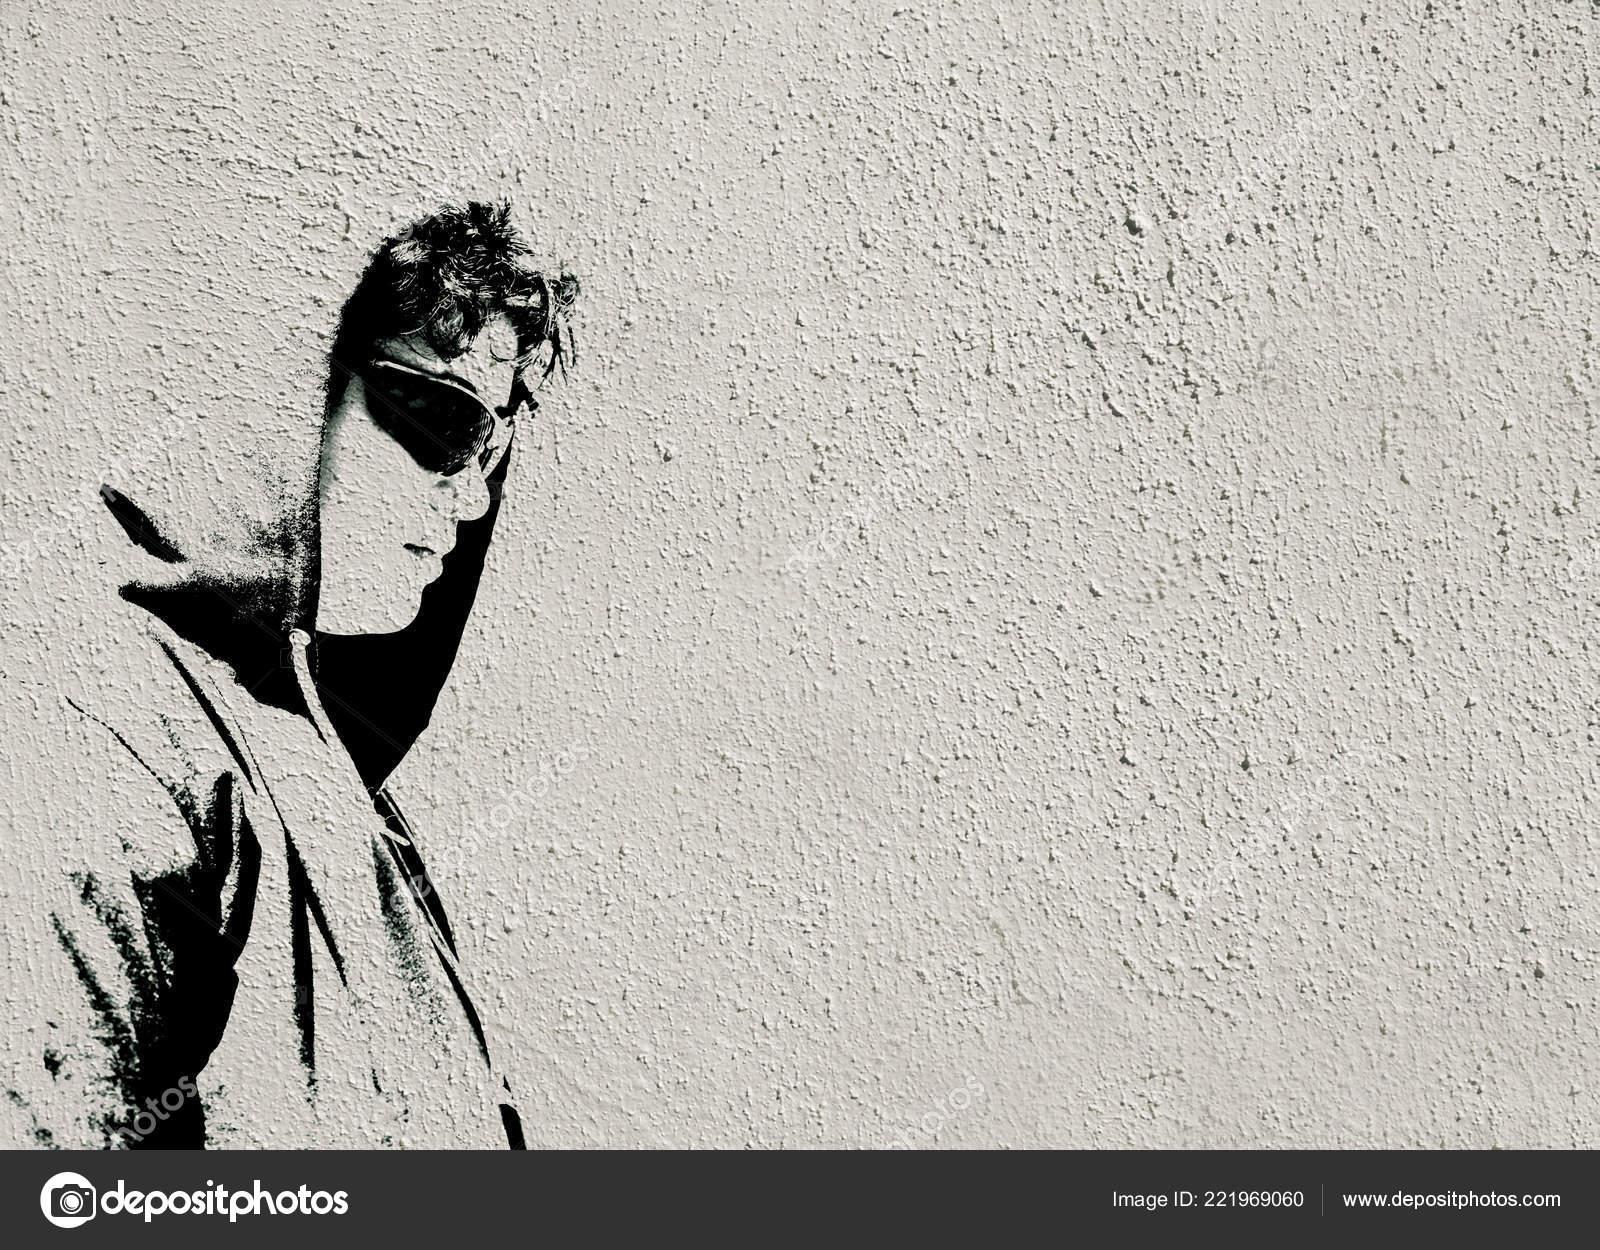 Sad troubled teenager school boy hood dark sunglasses posing